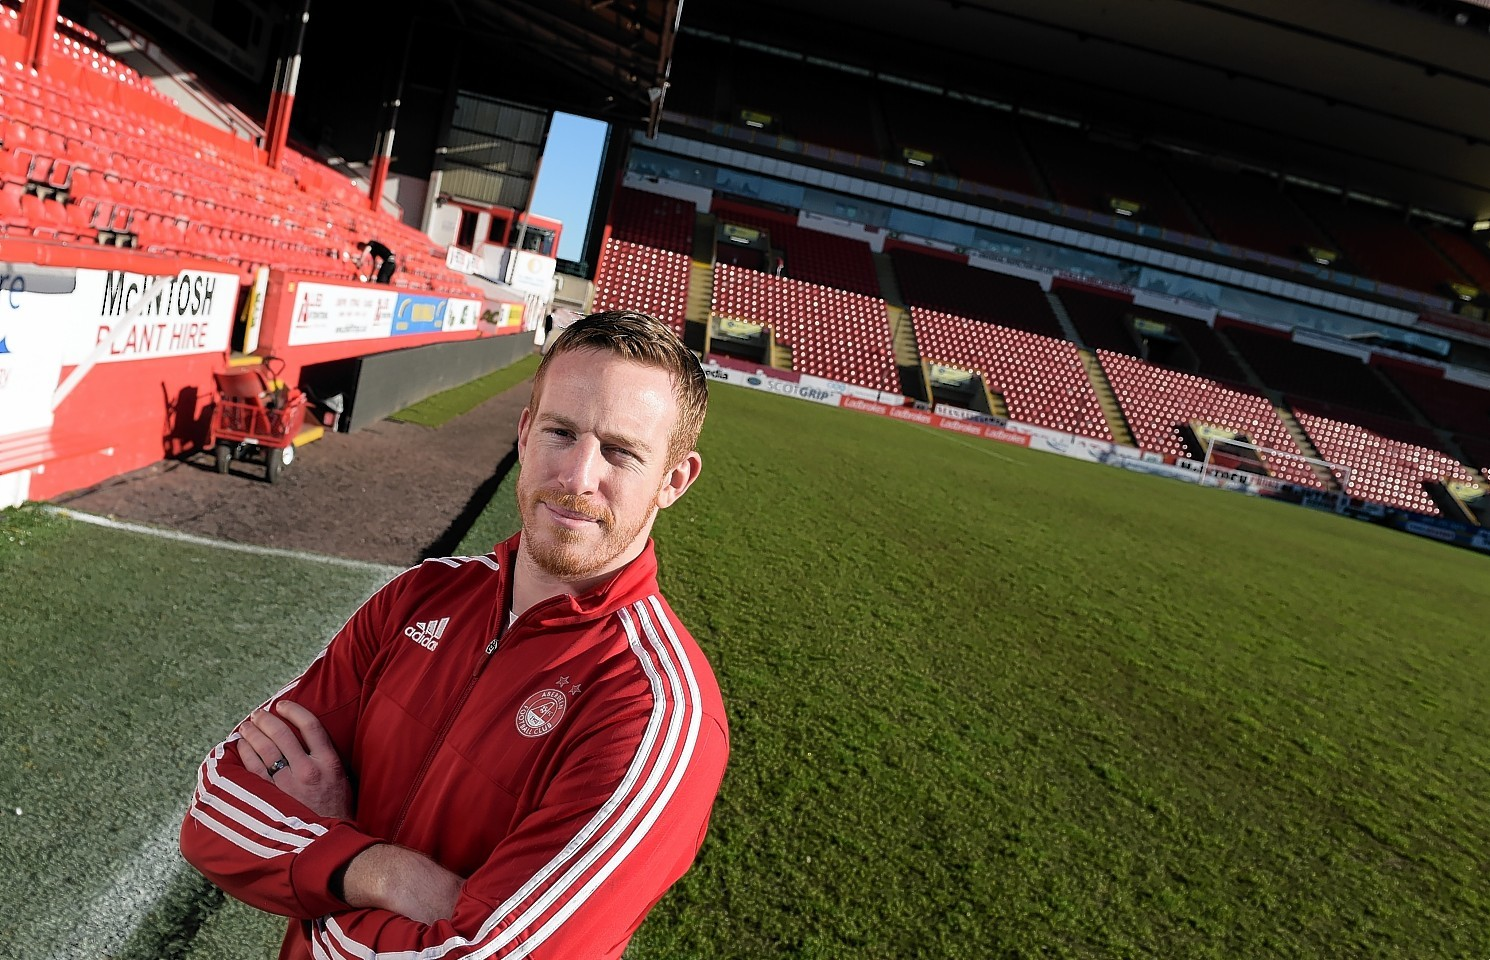 Aberdeen striker Adam Rooney scored a last-minute winner against St Johnstone.